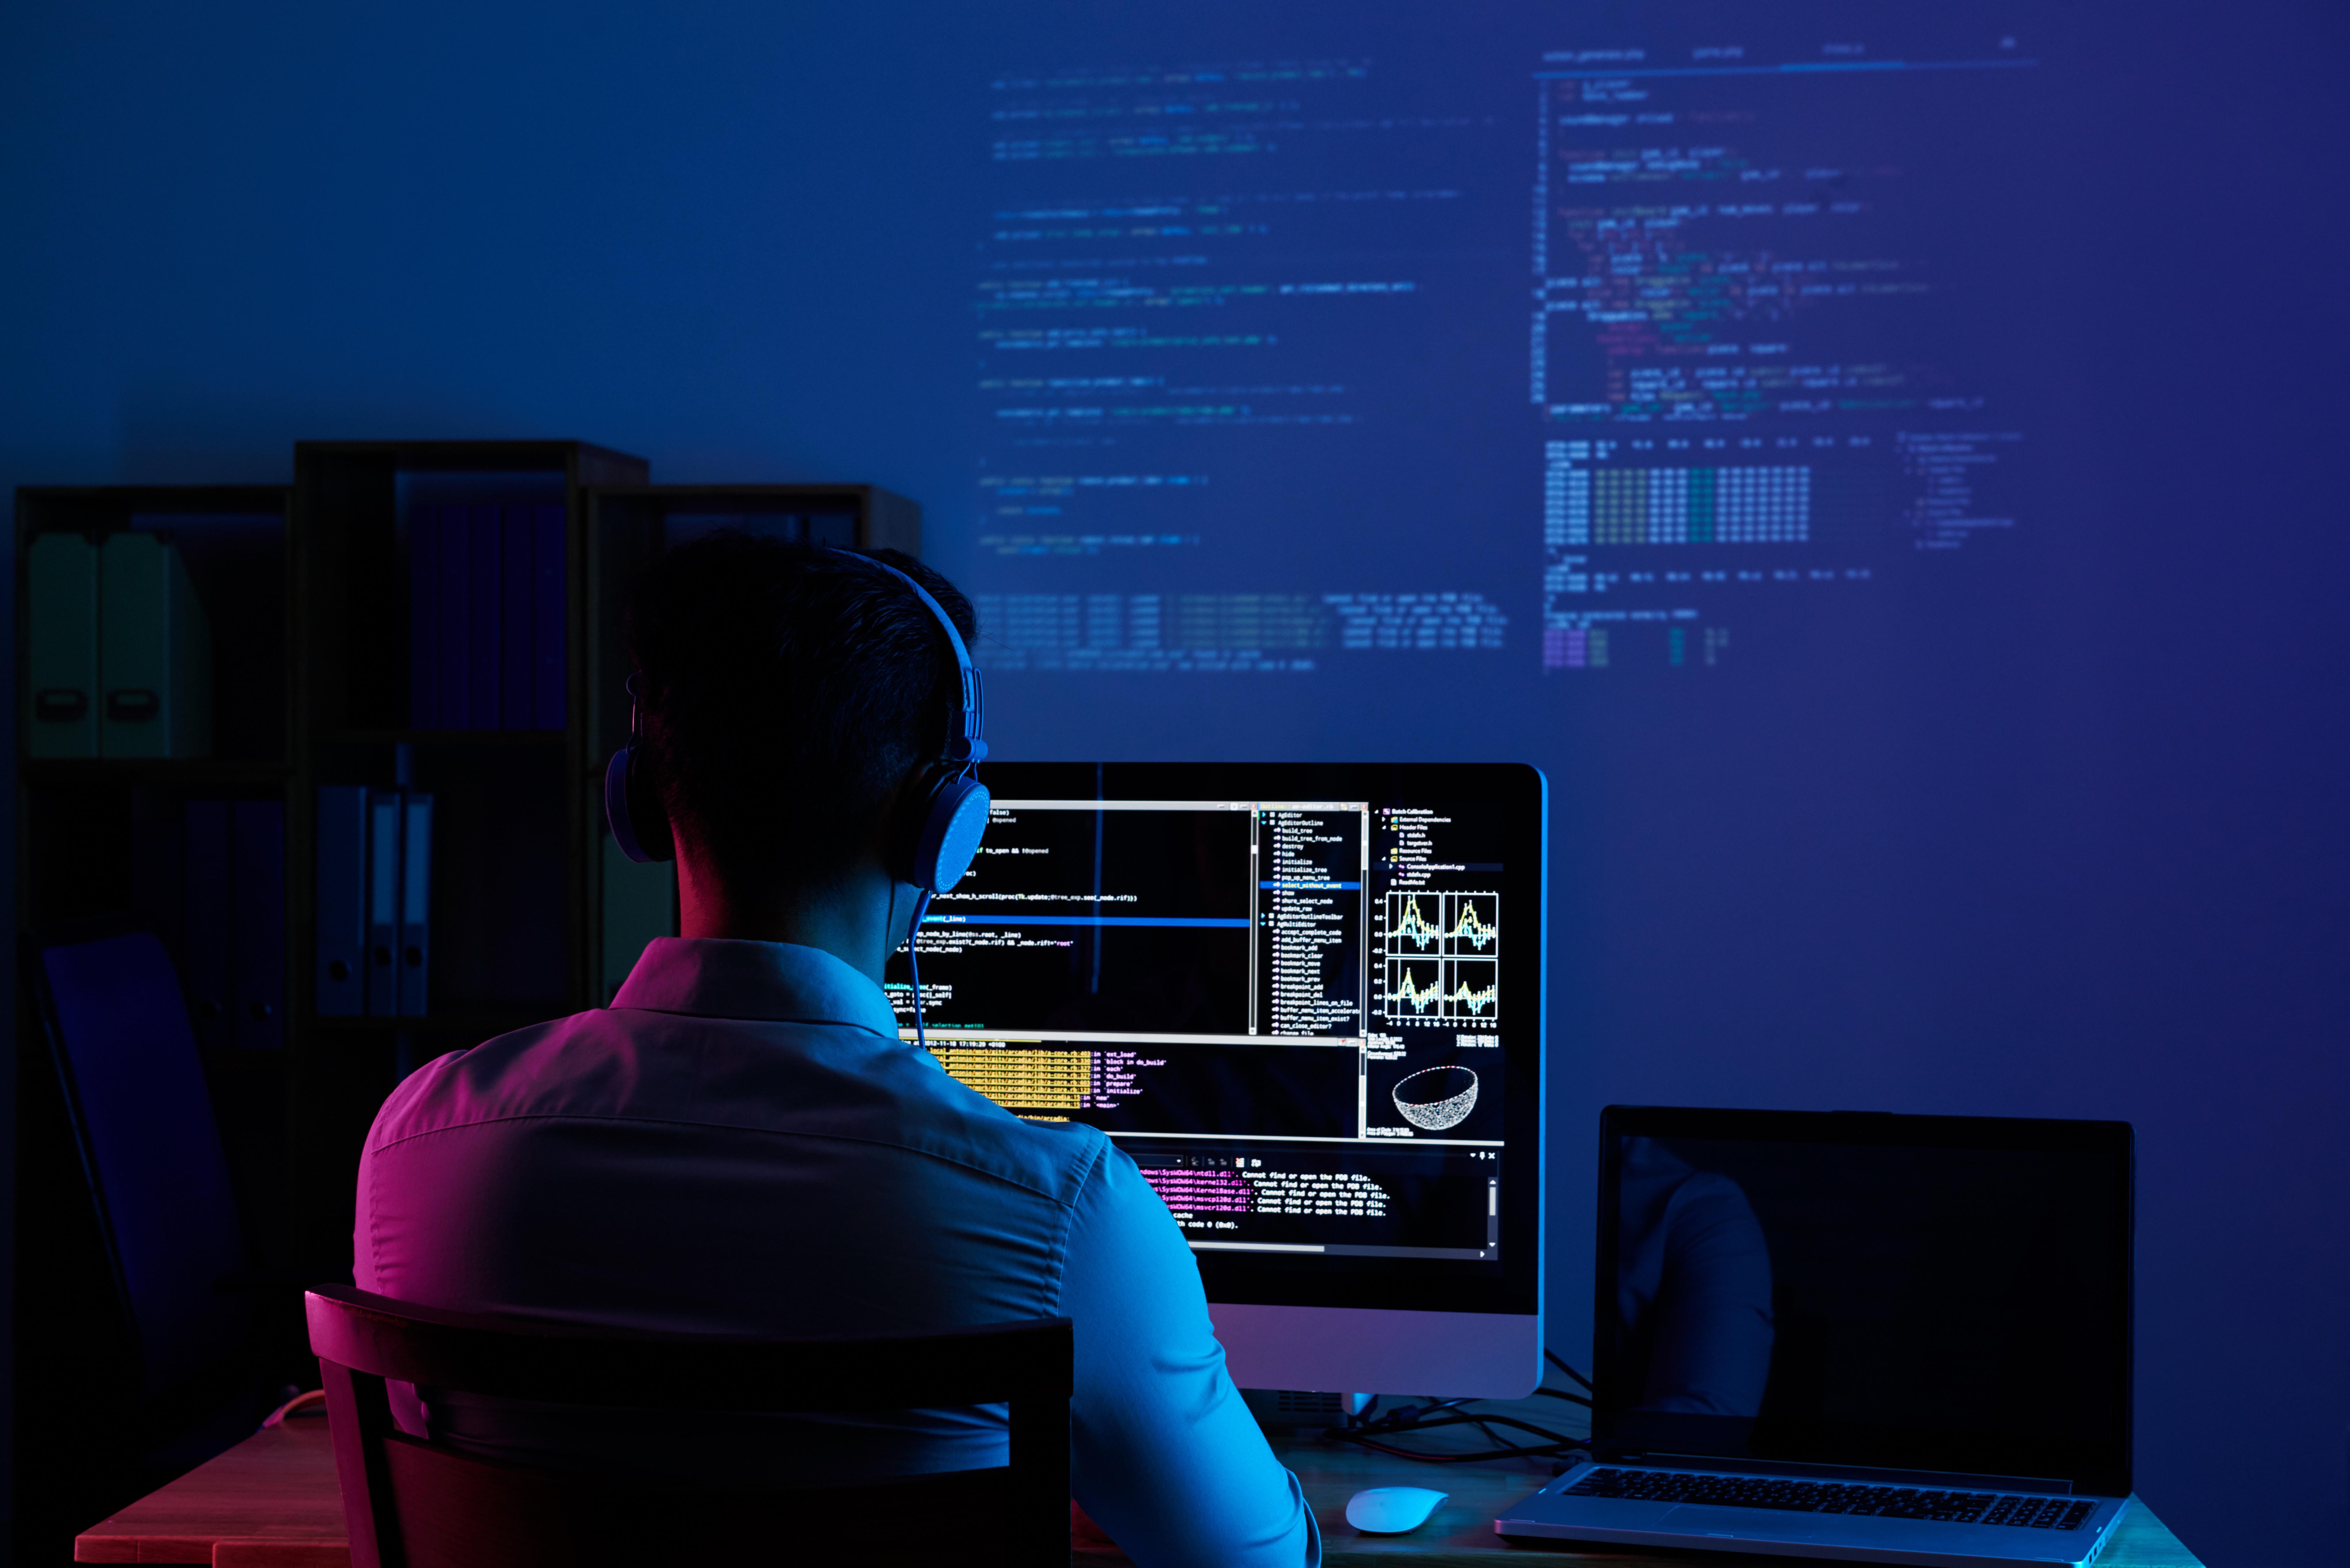 rear-view-programmer-working-all-night-long.jpg